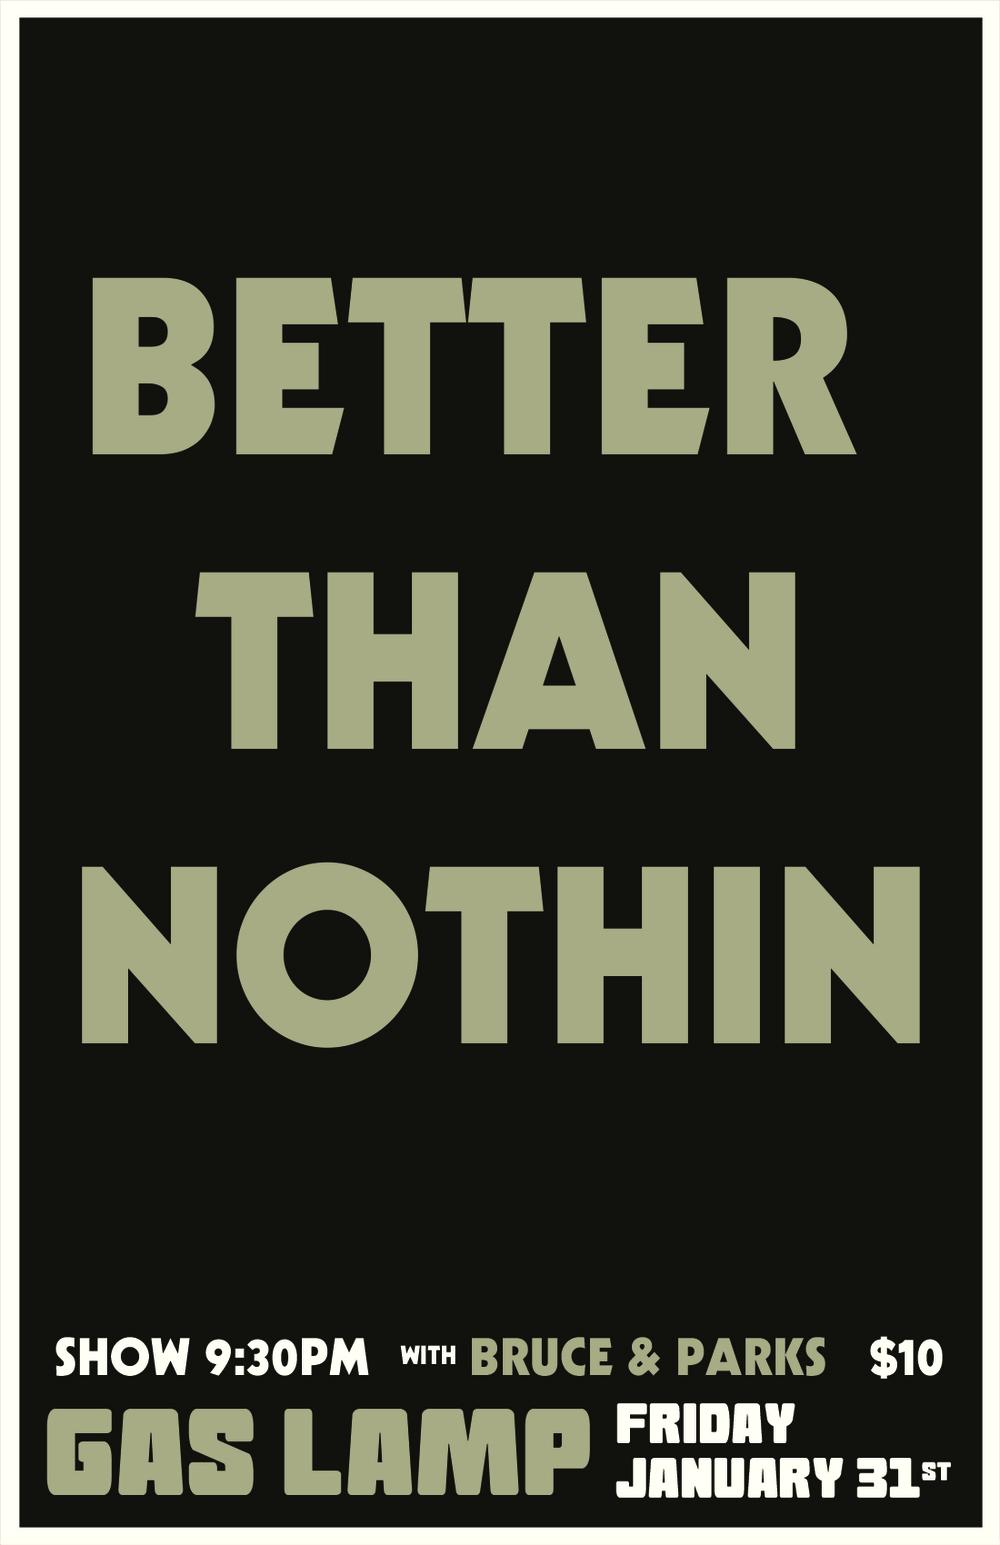 Better_than_nothin_jan_31